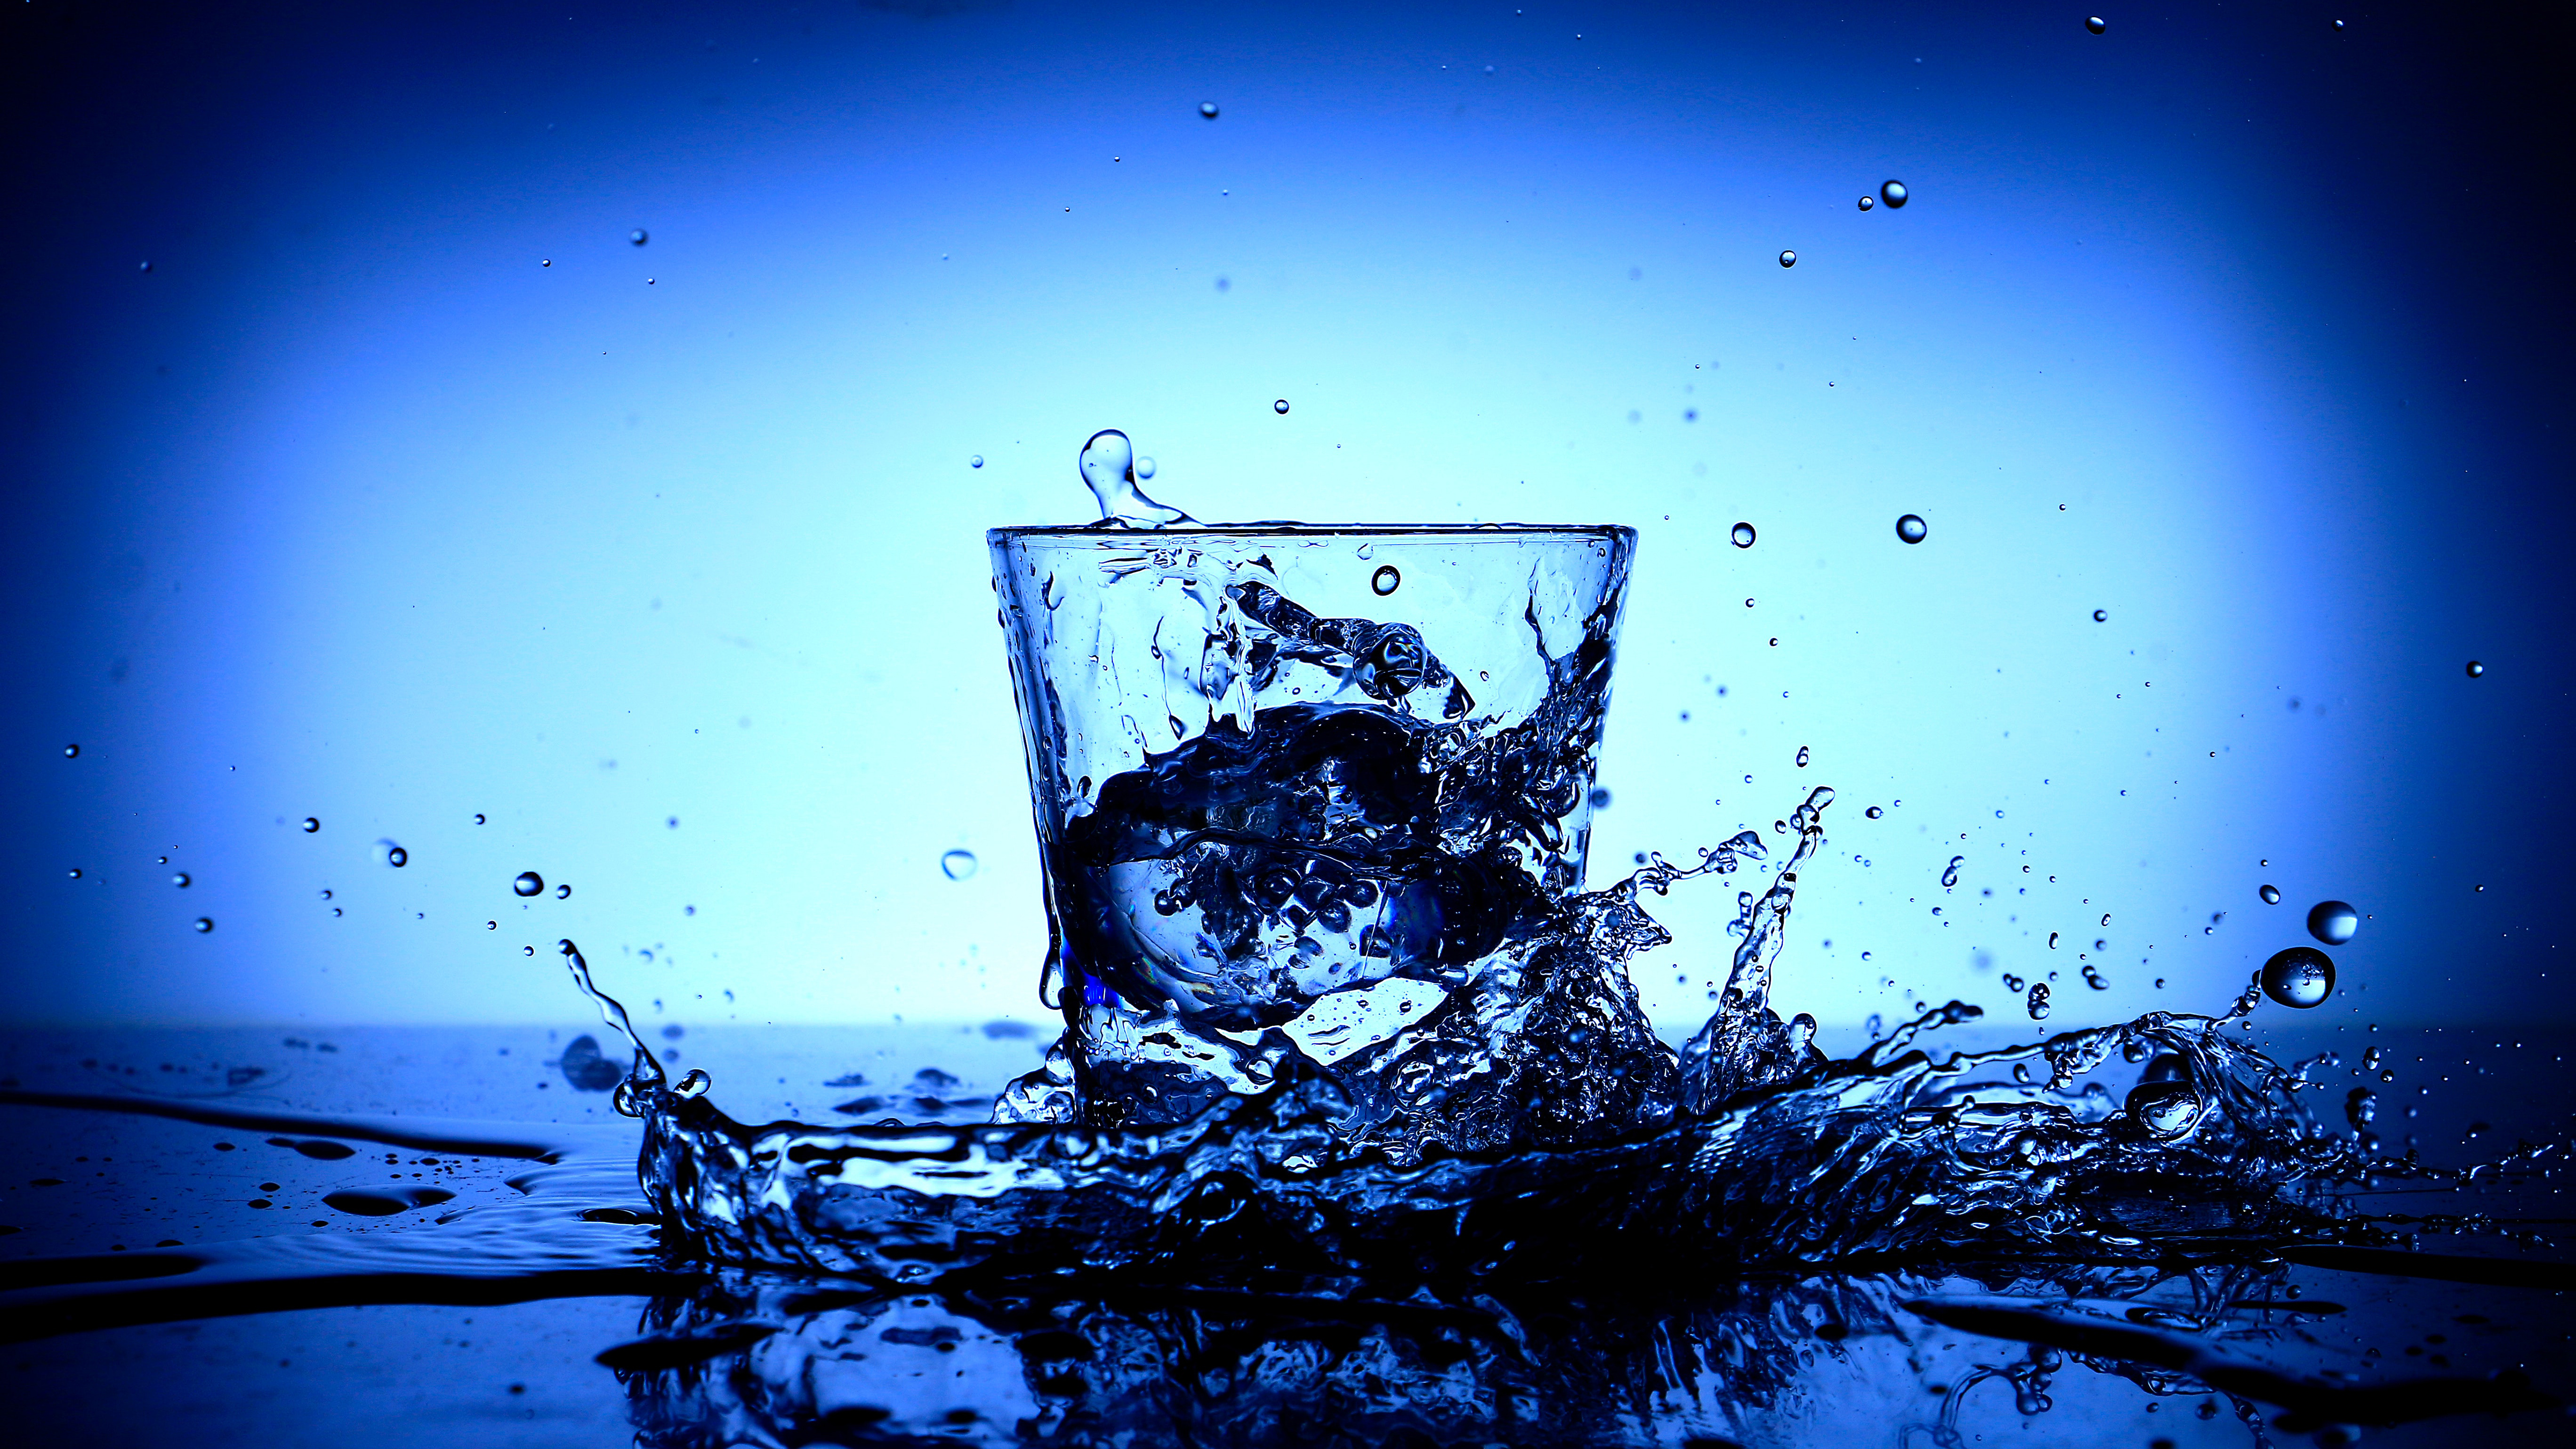 Glass Water Splash 5k Retina Ultra Hd Wallpaper Background Image